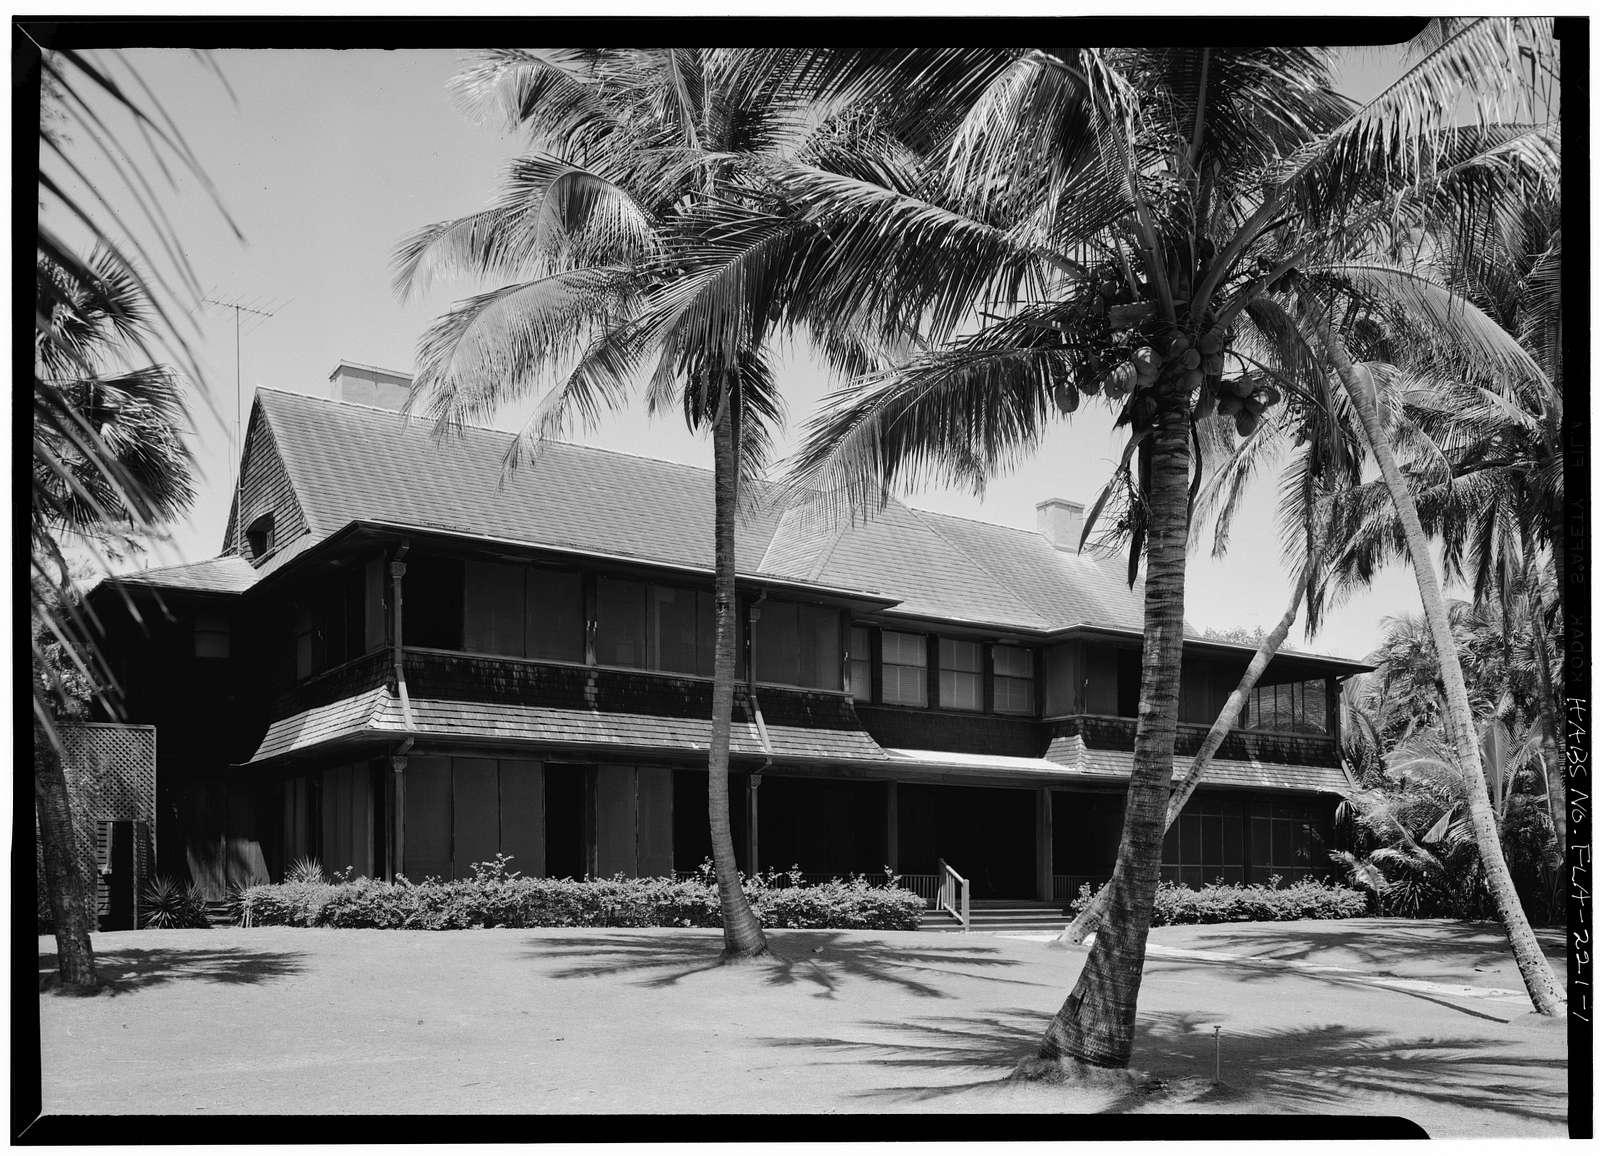 Bingham-Blossom House, 1250 South Ocean Boulevard, Palm Beach, Palm Beach County, FL